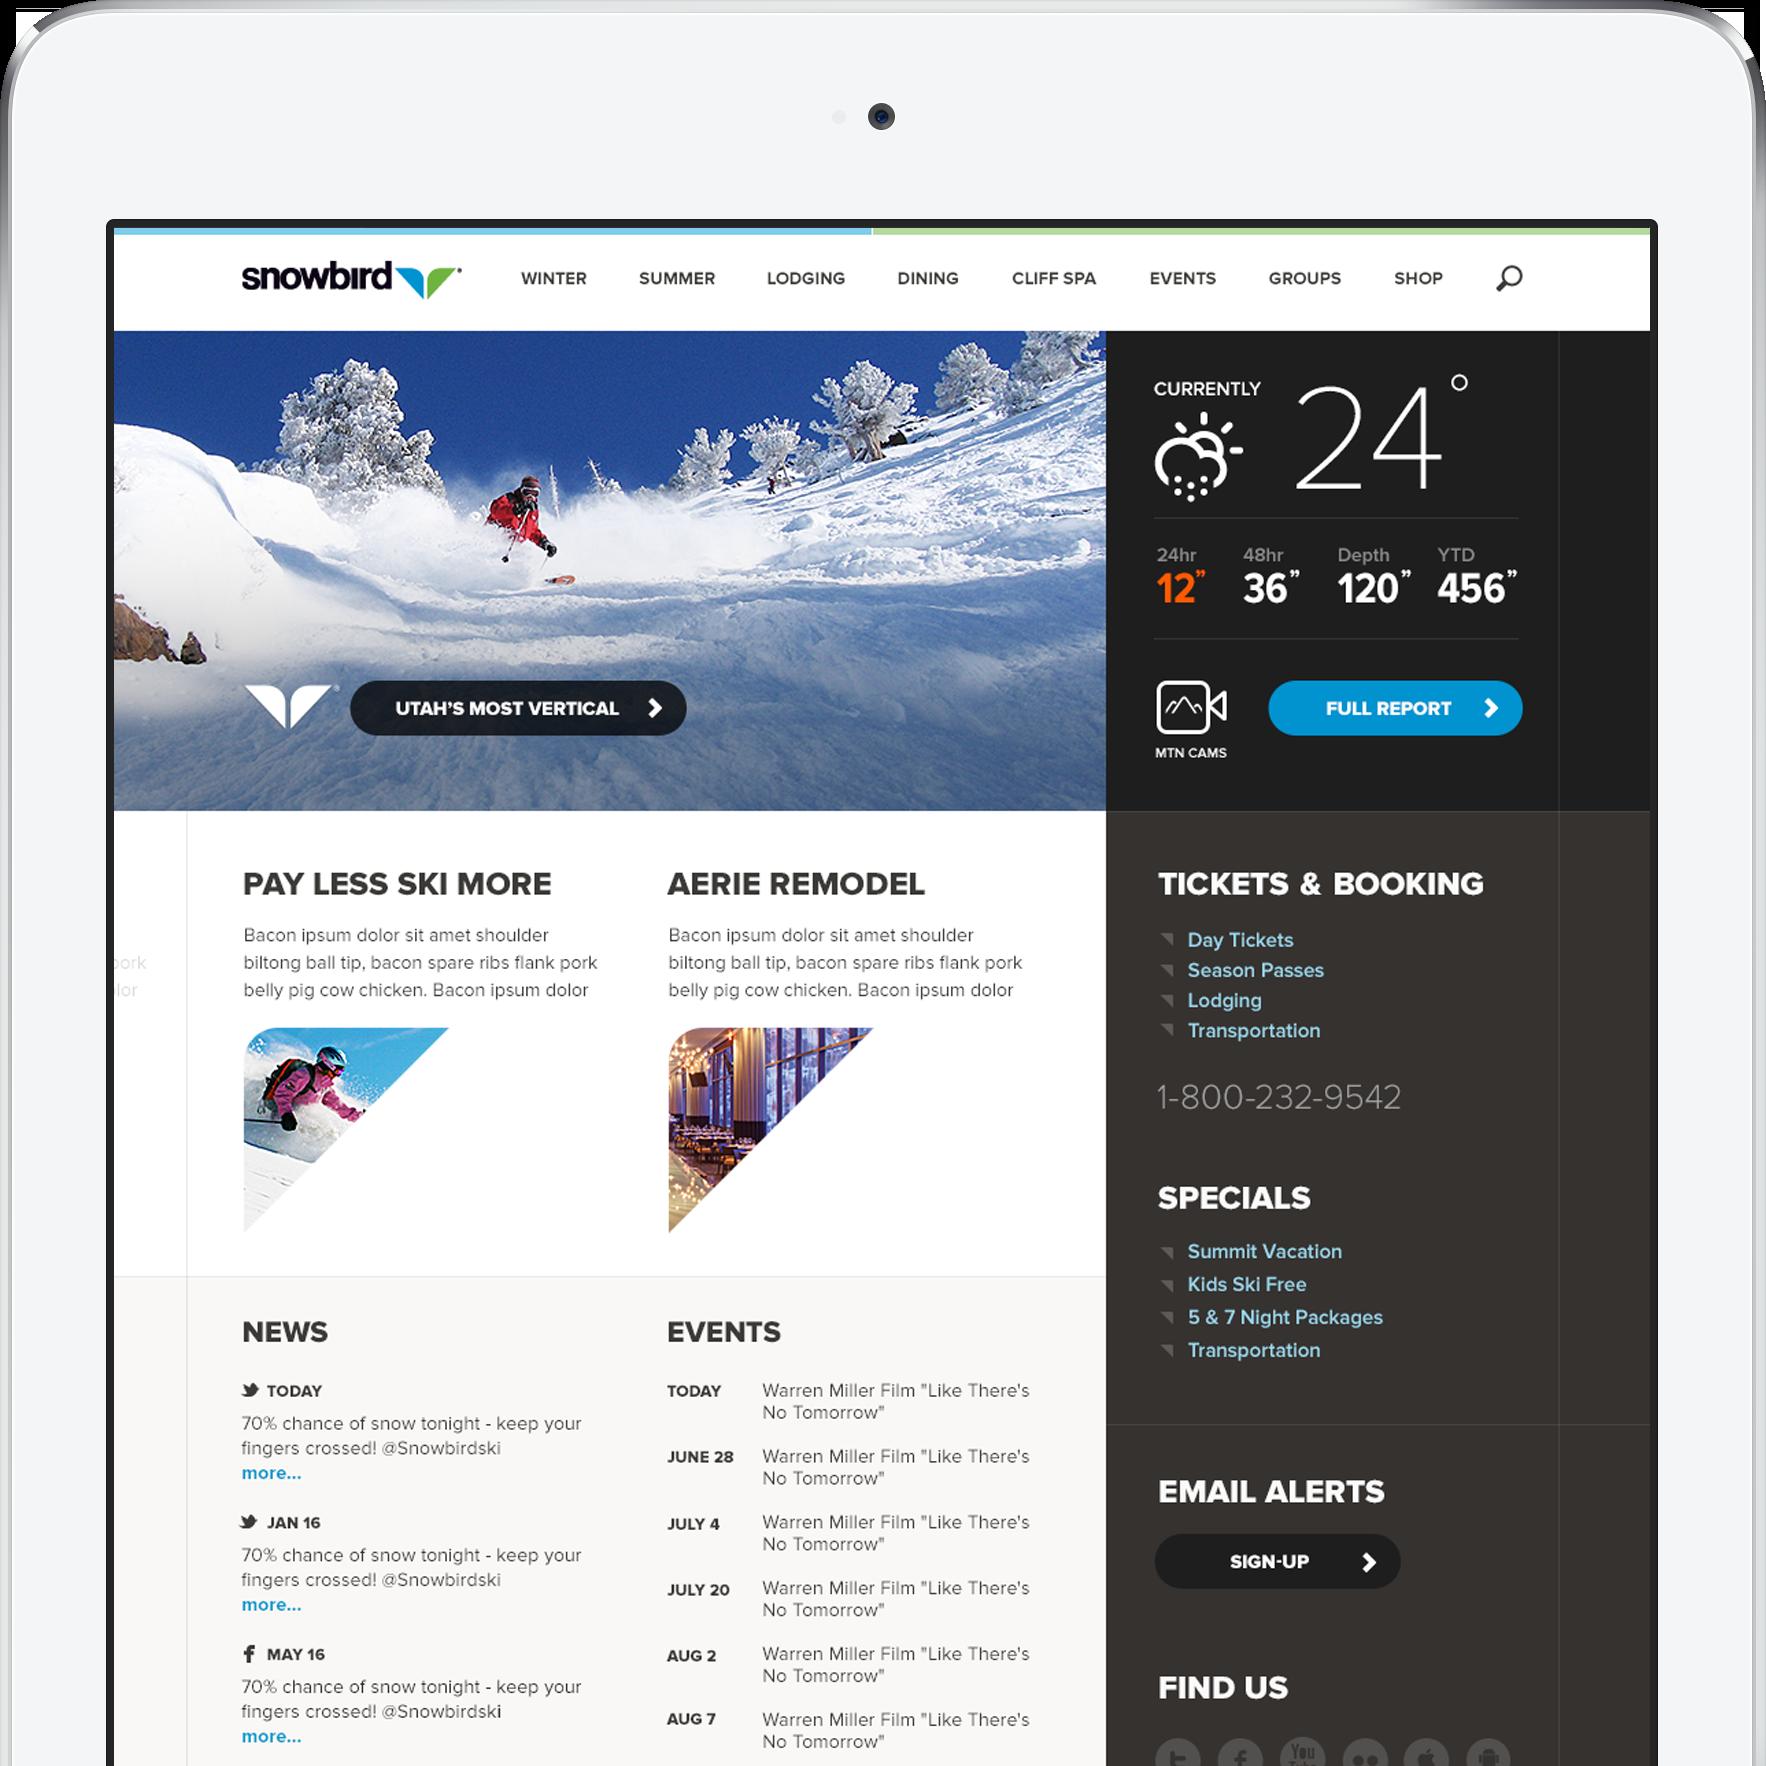 iPad Air 2 Mockup Work 3b